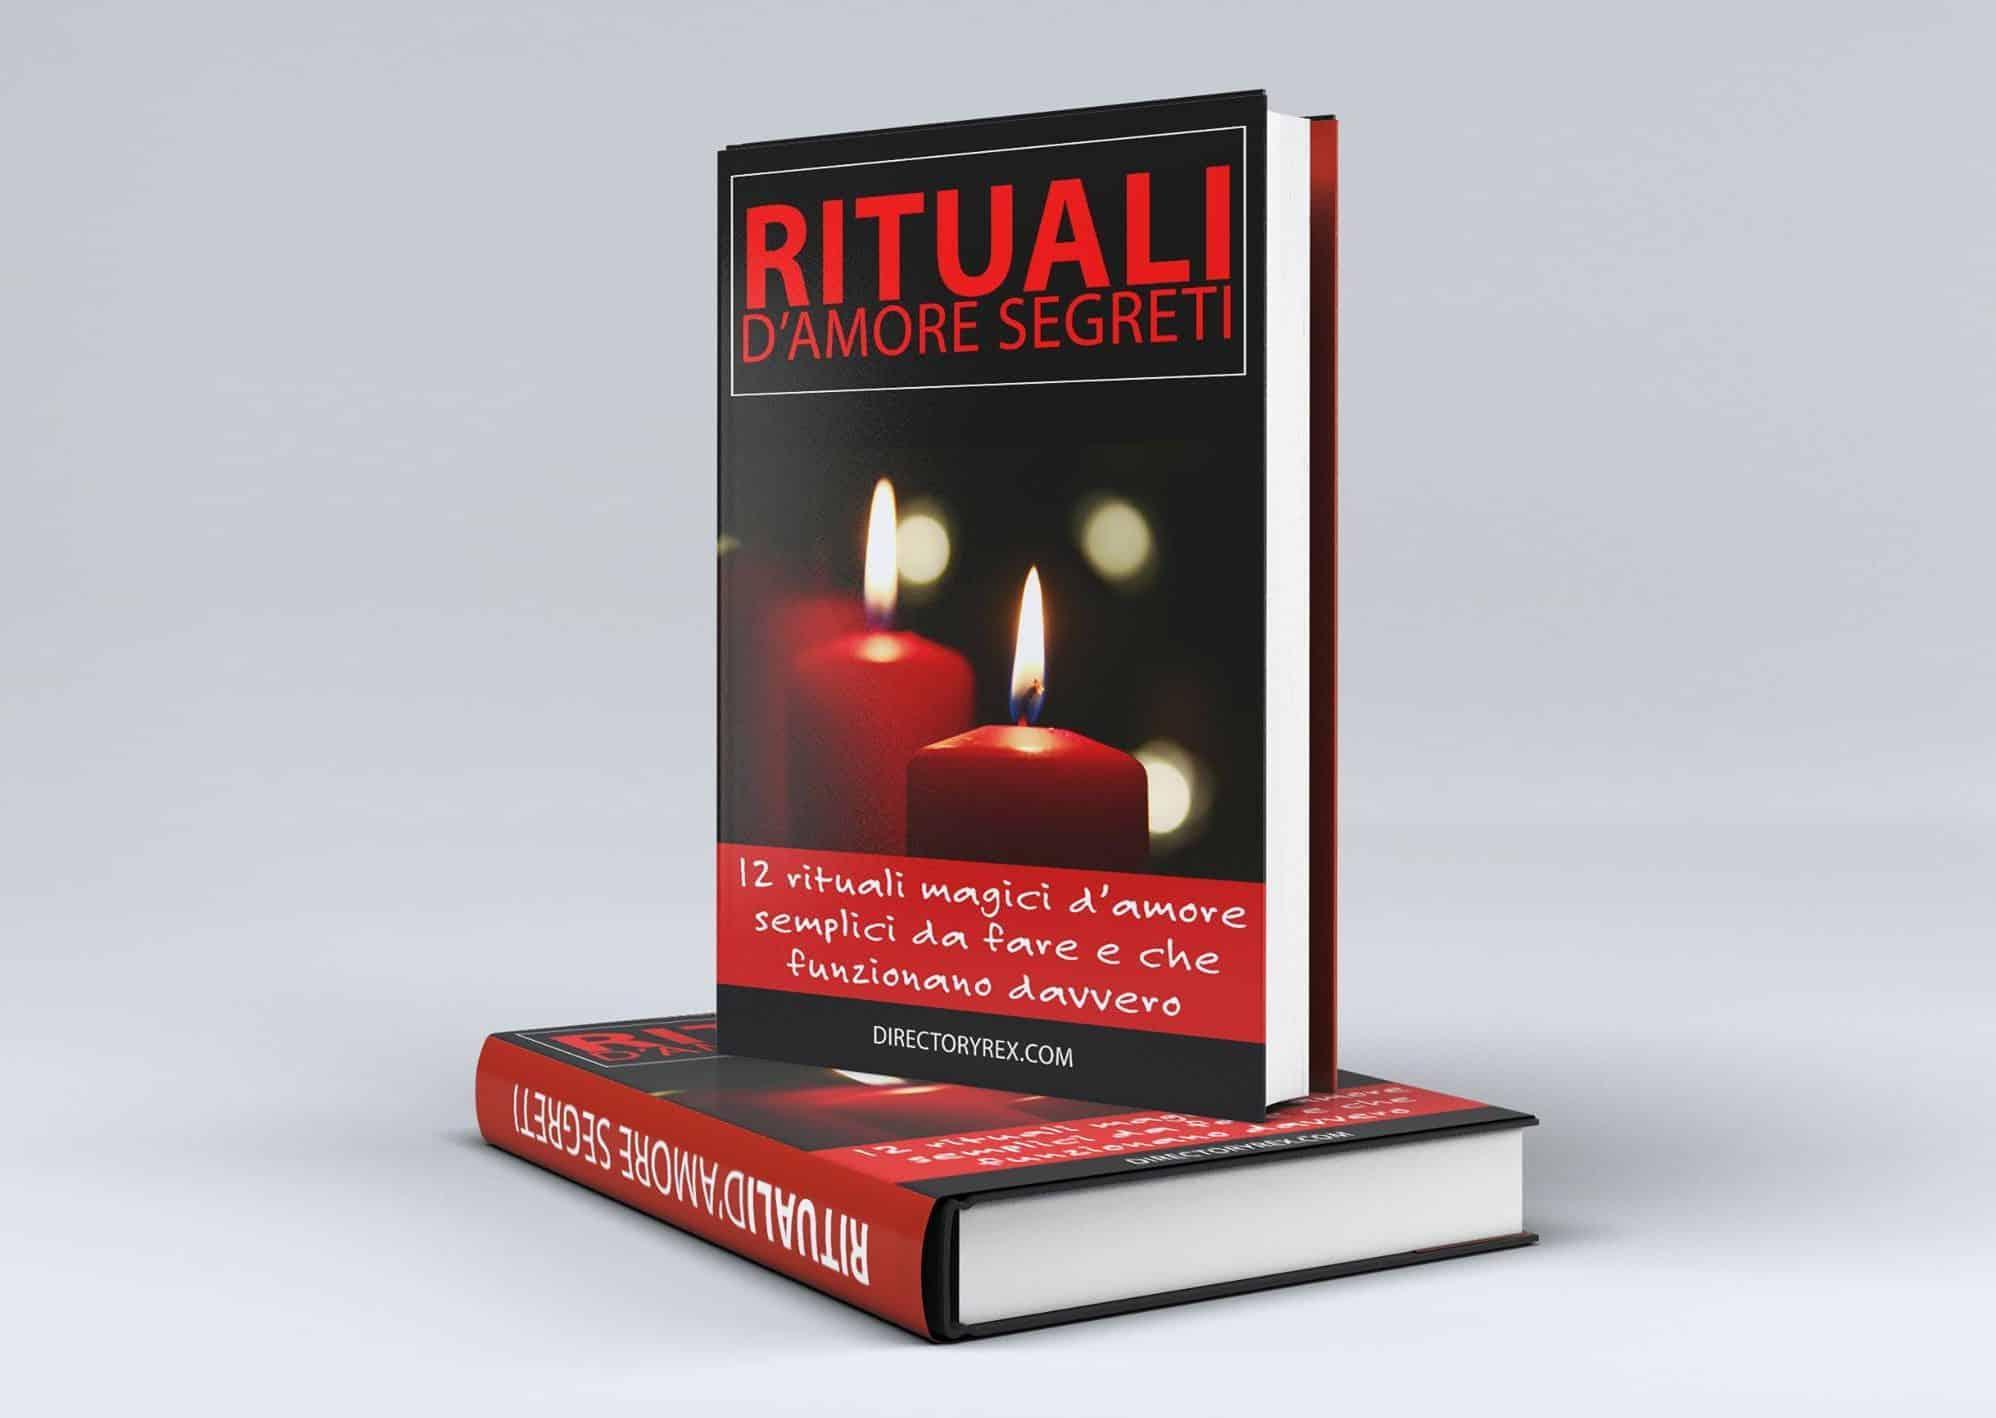 rituali d'amore segreti